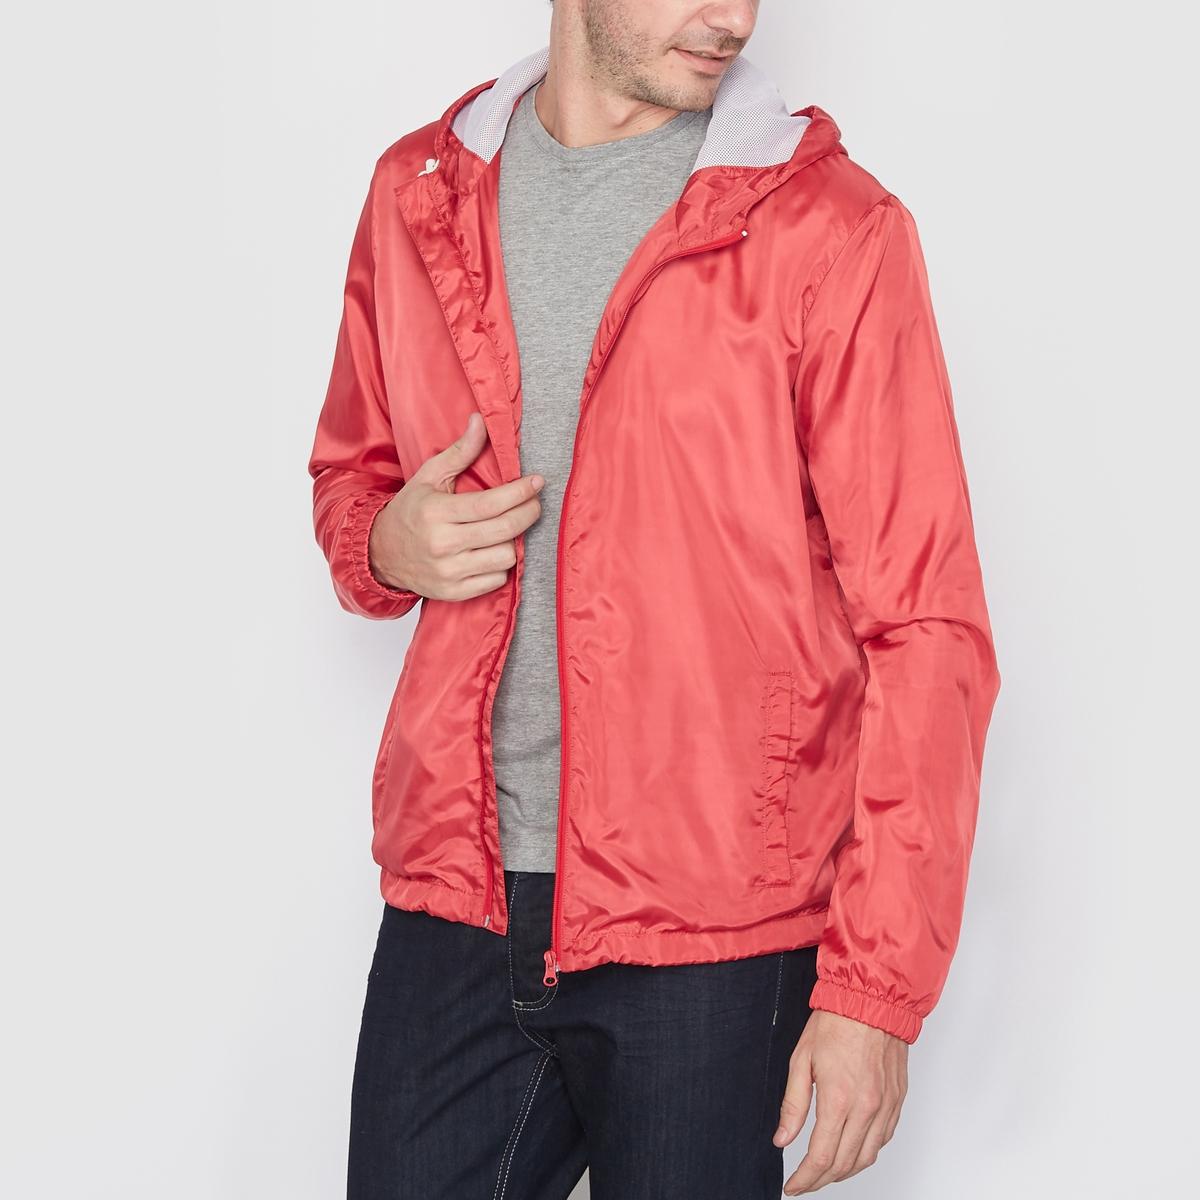 Куртка-ветровка на молнии с капюшоном от La Redoute